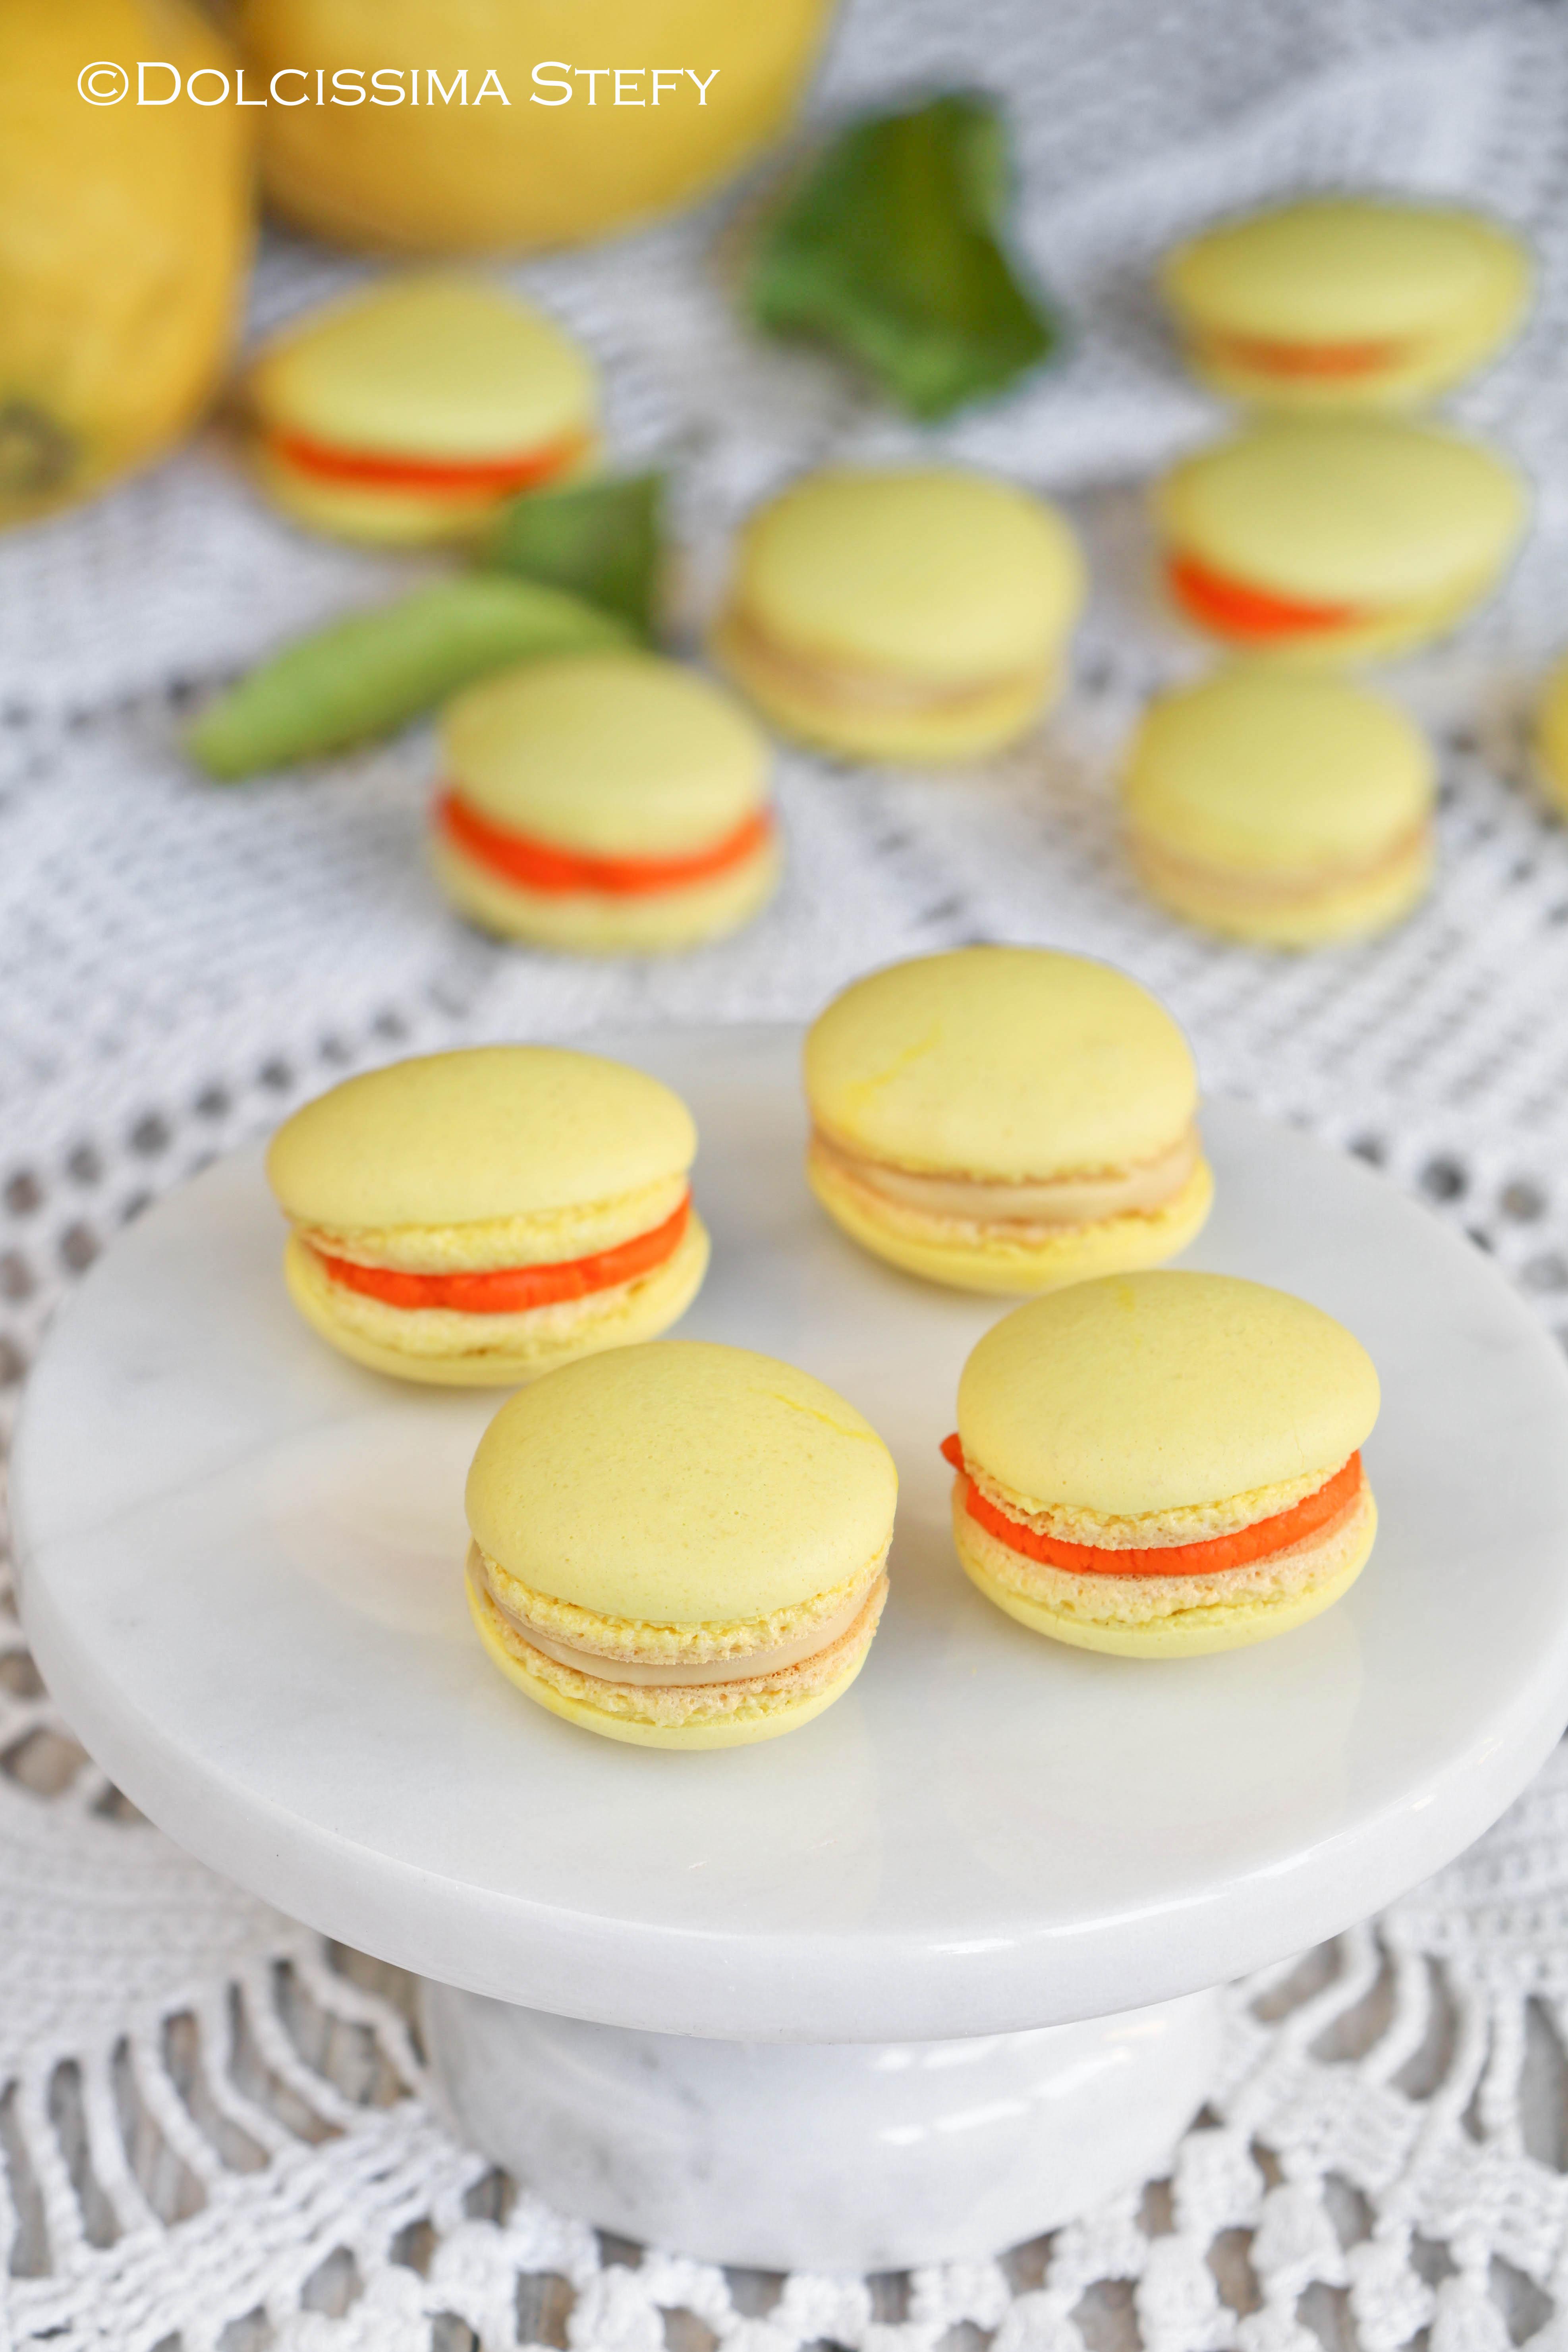 macaron al limone - dolcissima stefy